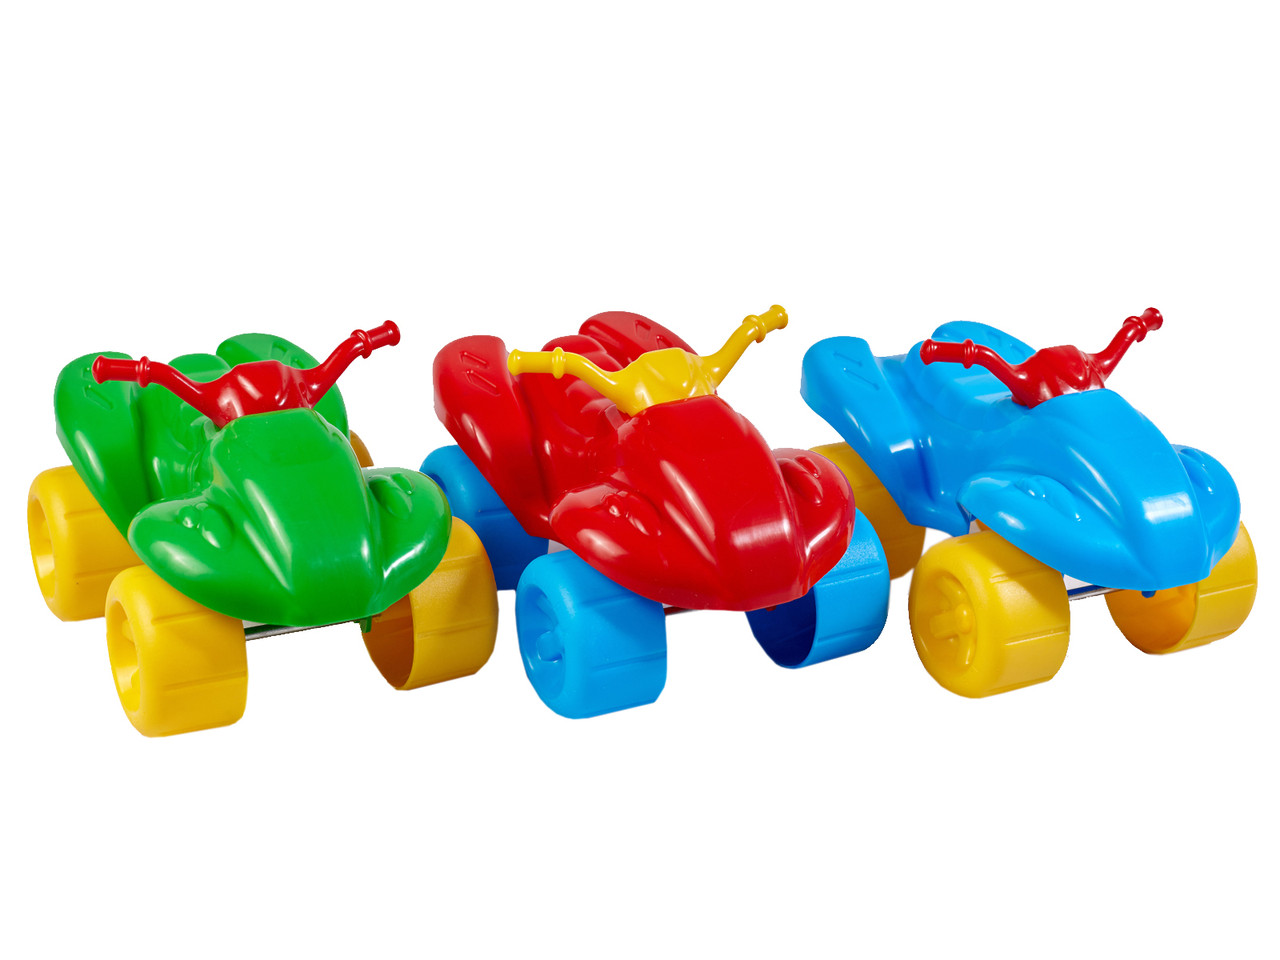 "Игрушка Машинка ""Максік"" Квадроцикл пластмасса  Технок - Style-Baby детский магазин в Киеве"